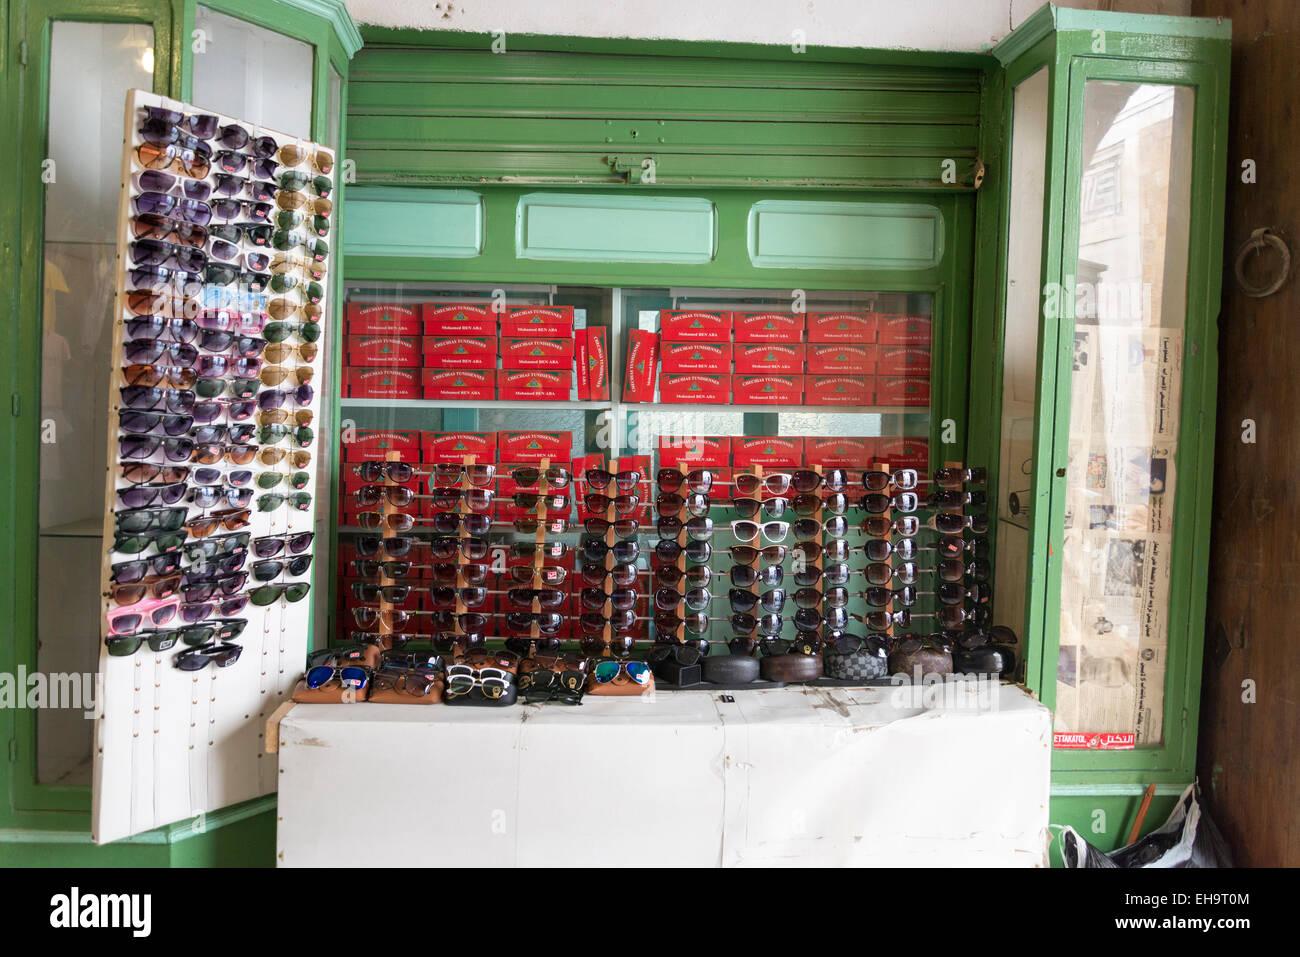 sunglass stall in medina, Tunisa - Stock Image